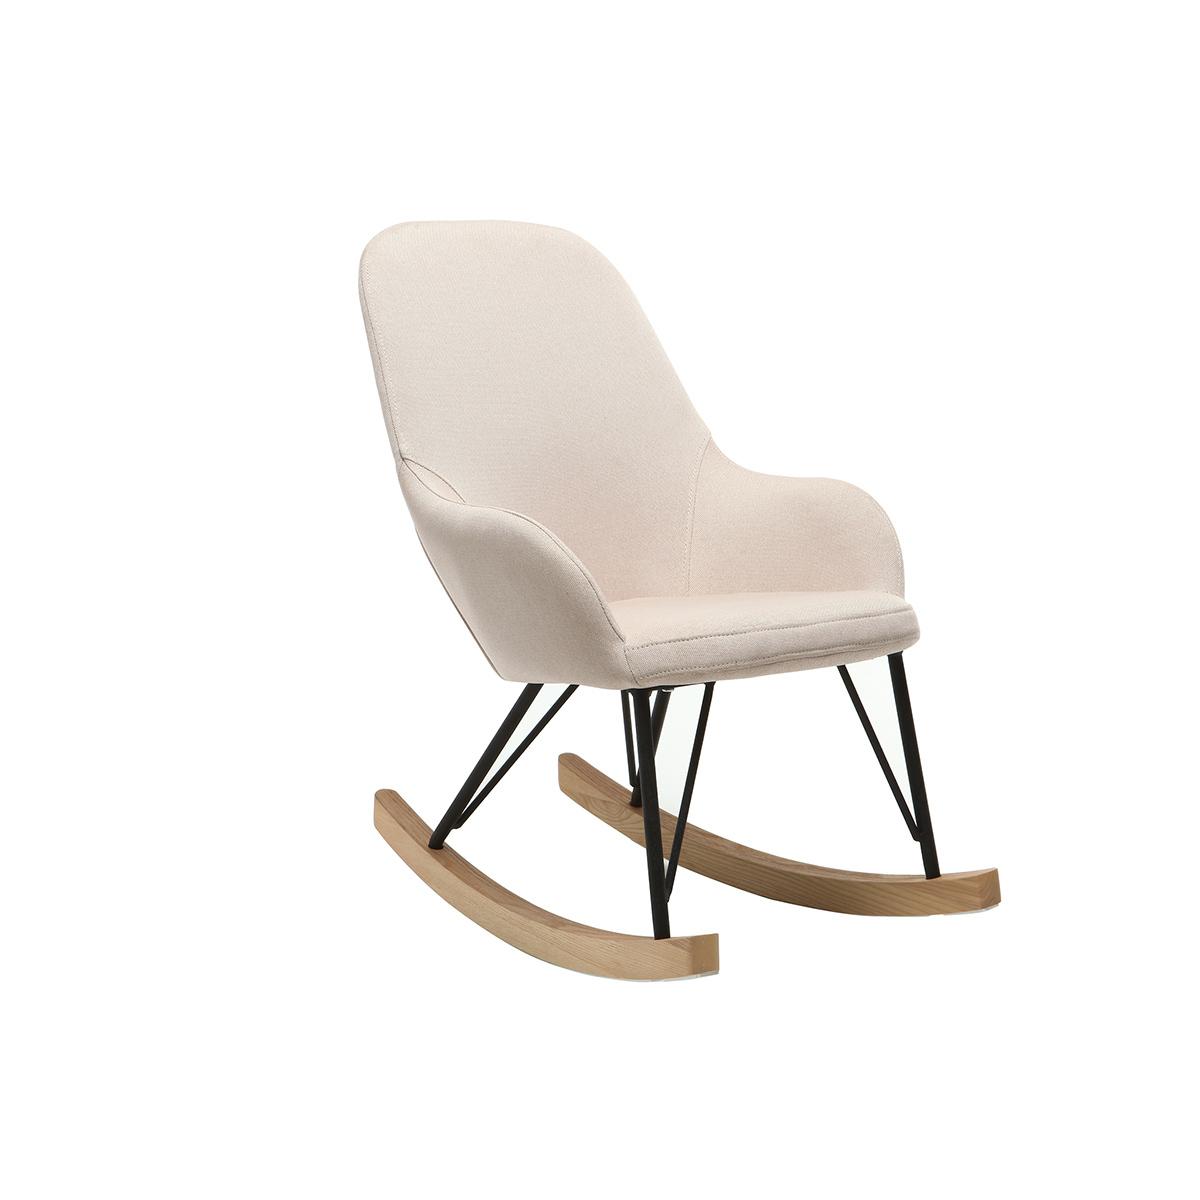 Poltrona relax - Baby sedia a dondolo tessuto naturale gambe in metallo e frassino JHENE